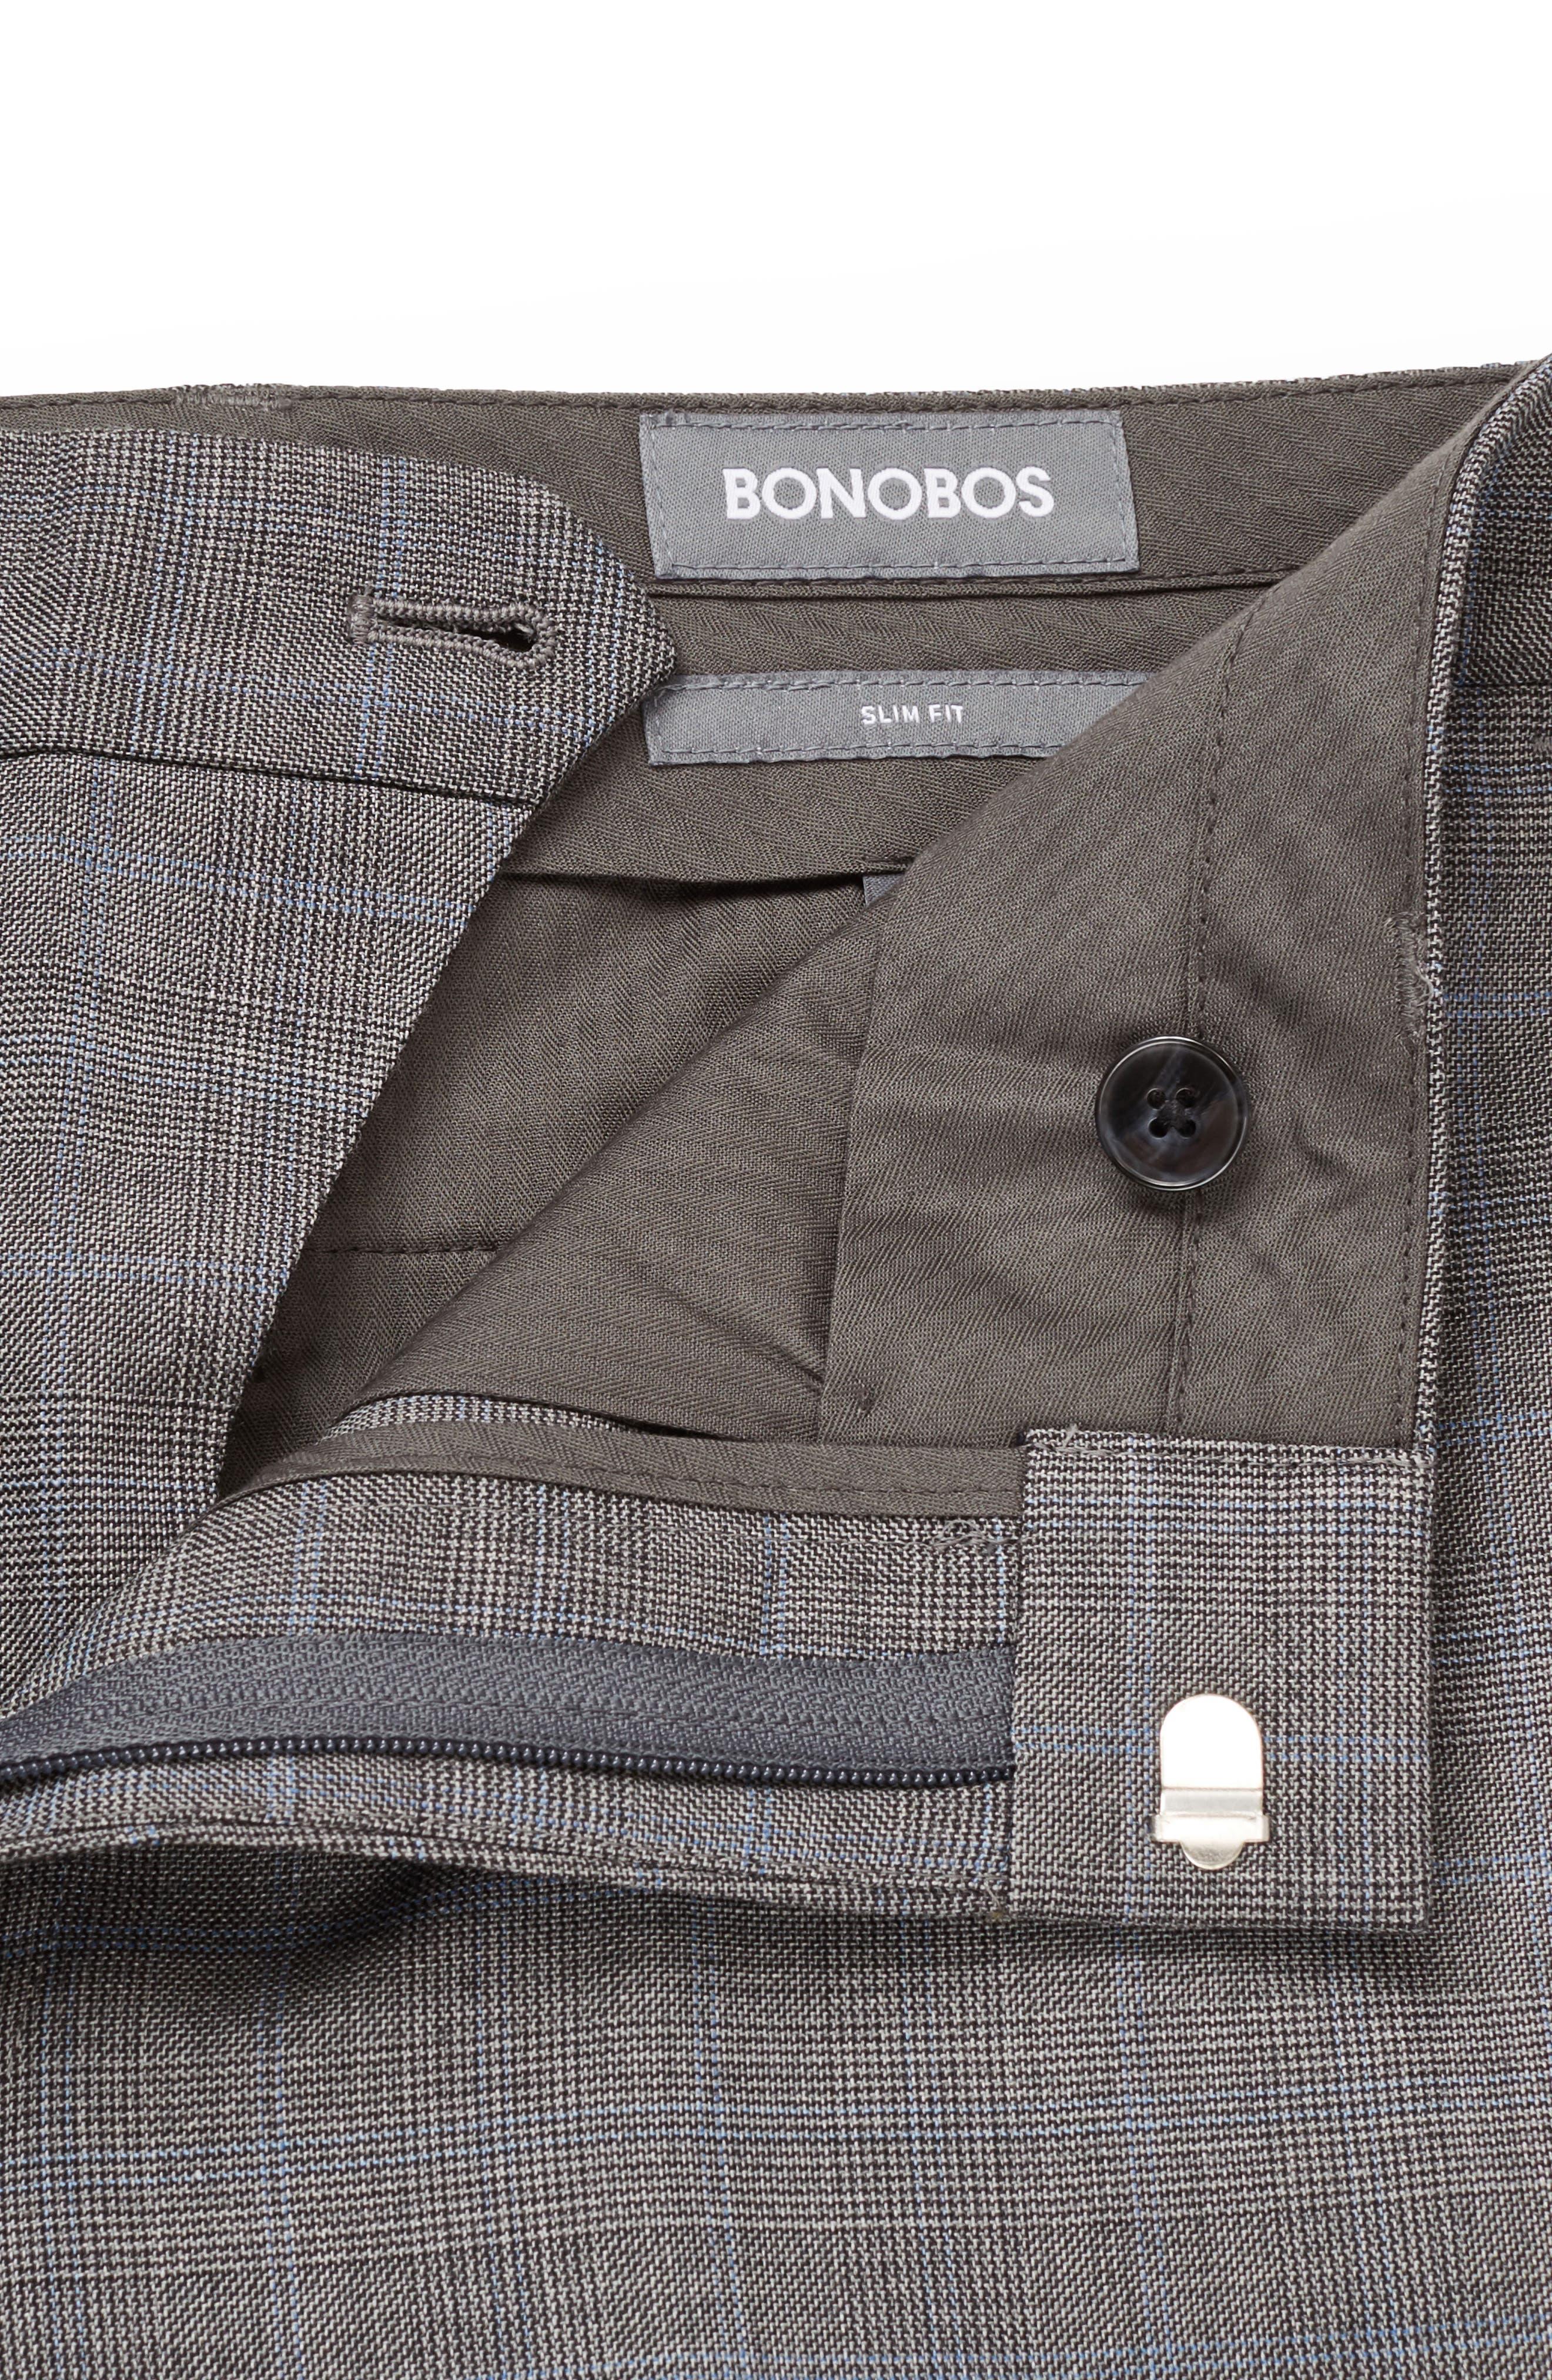 BONOBOS, Jetsetter Flat Front Plaid Stretch Wool Trousers, Alternate thumbnail 3, color, 020